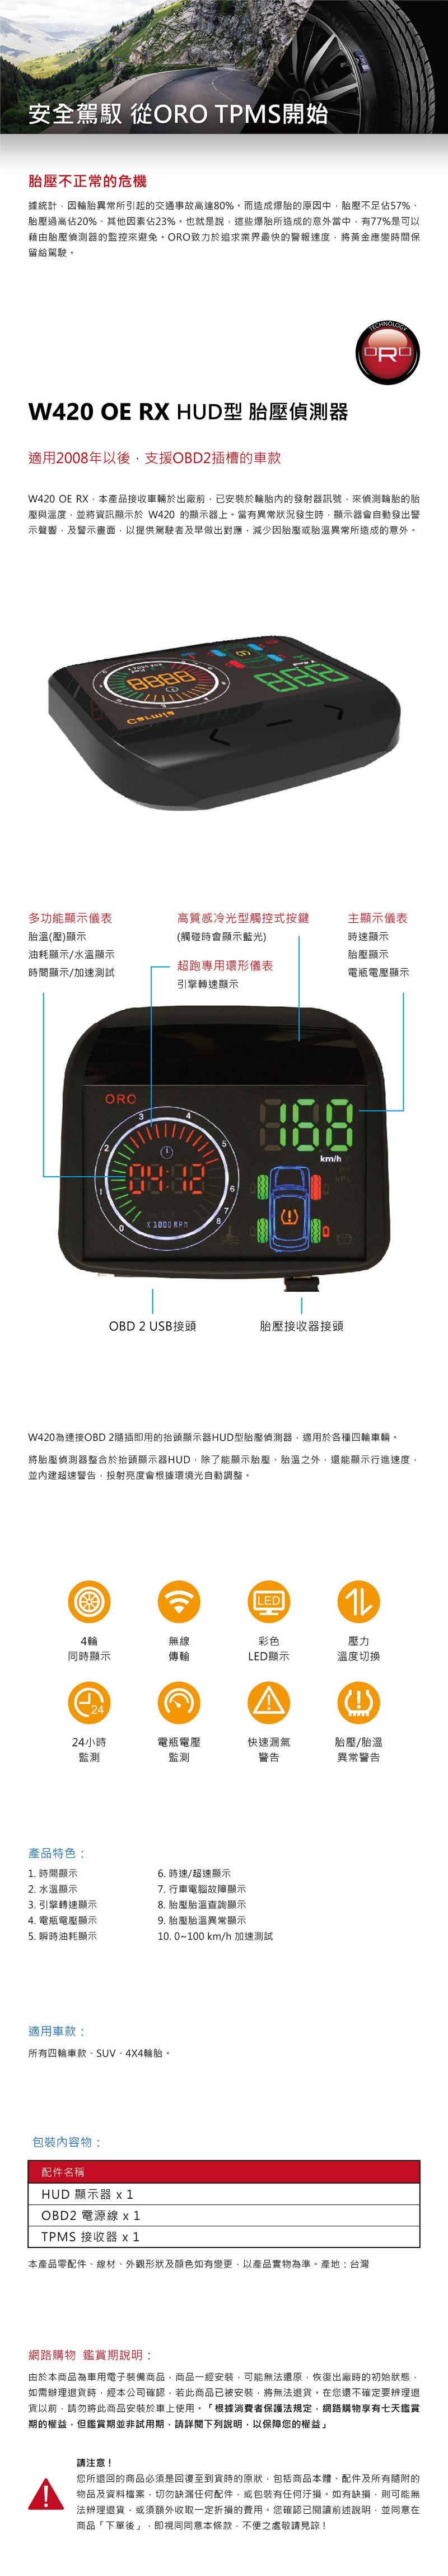 T6r【ORO W420 OE RX】抬頭型胎壓偵測器 配對原廠胎感器 螢幕顯示 台灣製|BuBu車用品